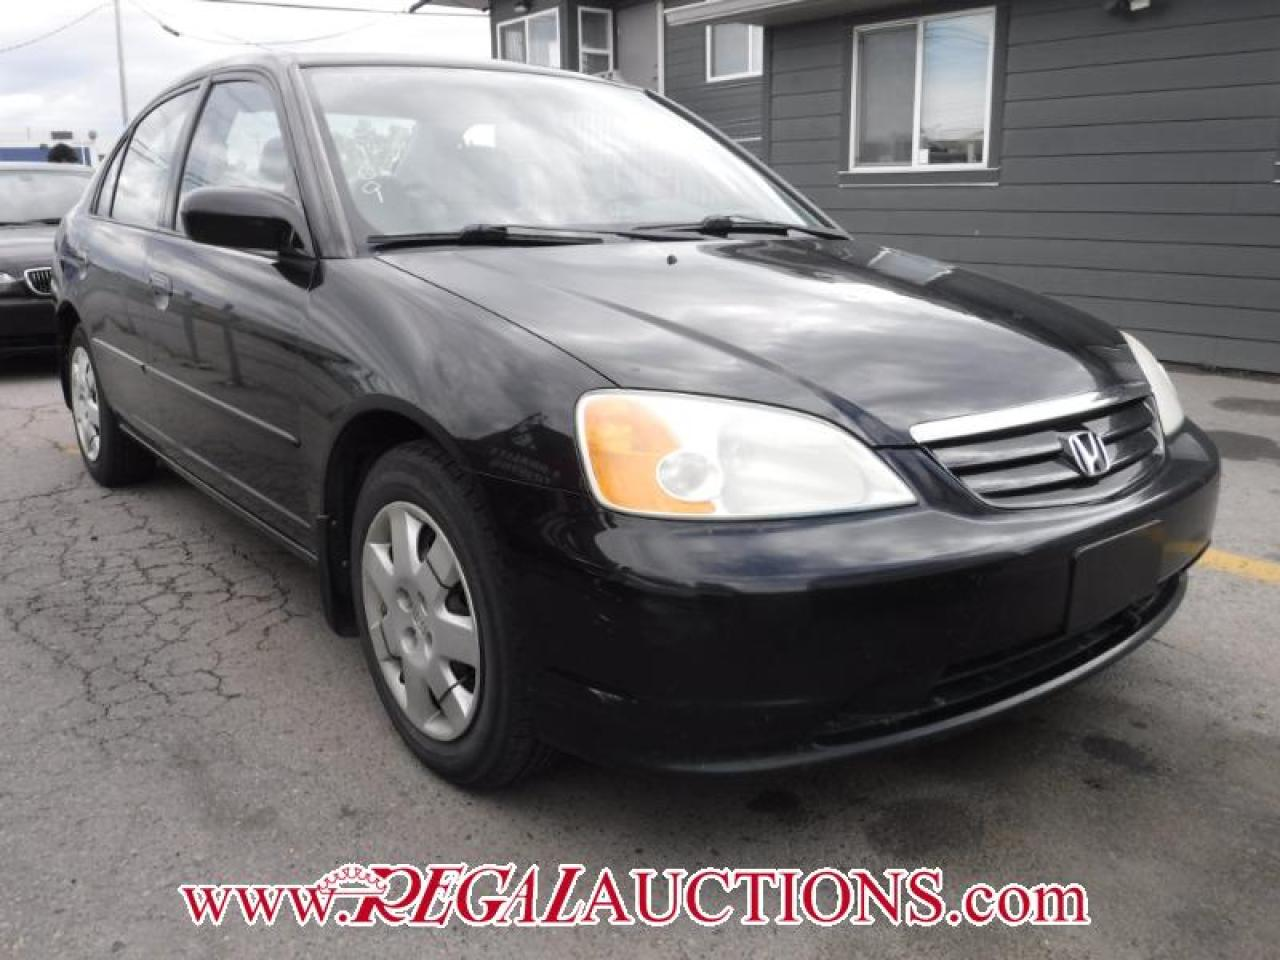 Photo of Black 2002 Honda Civic